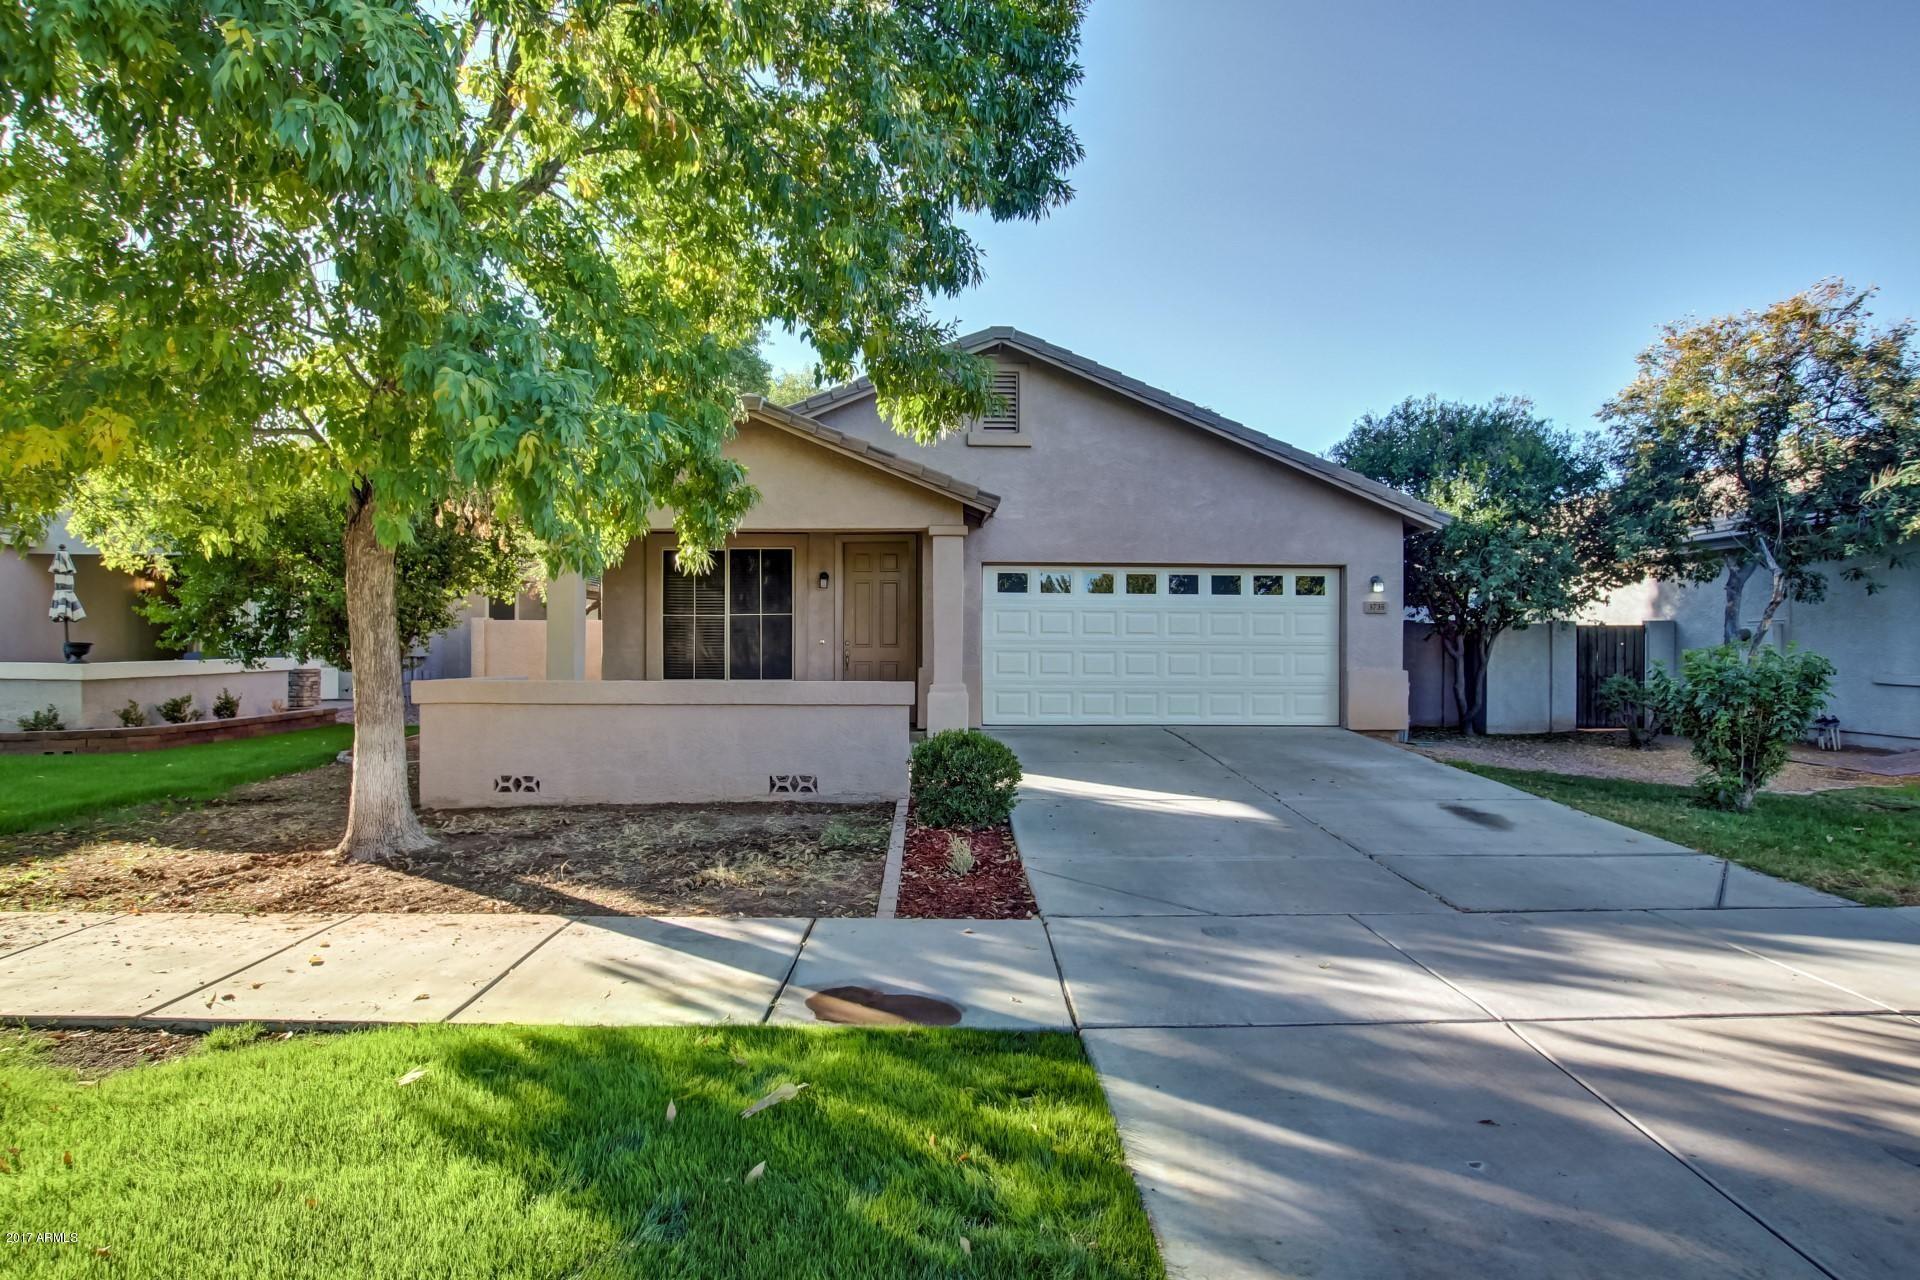 3735  E PARK   Avenue Gilbert AZ 85234